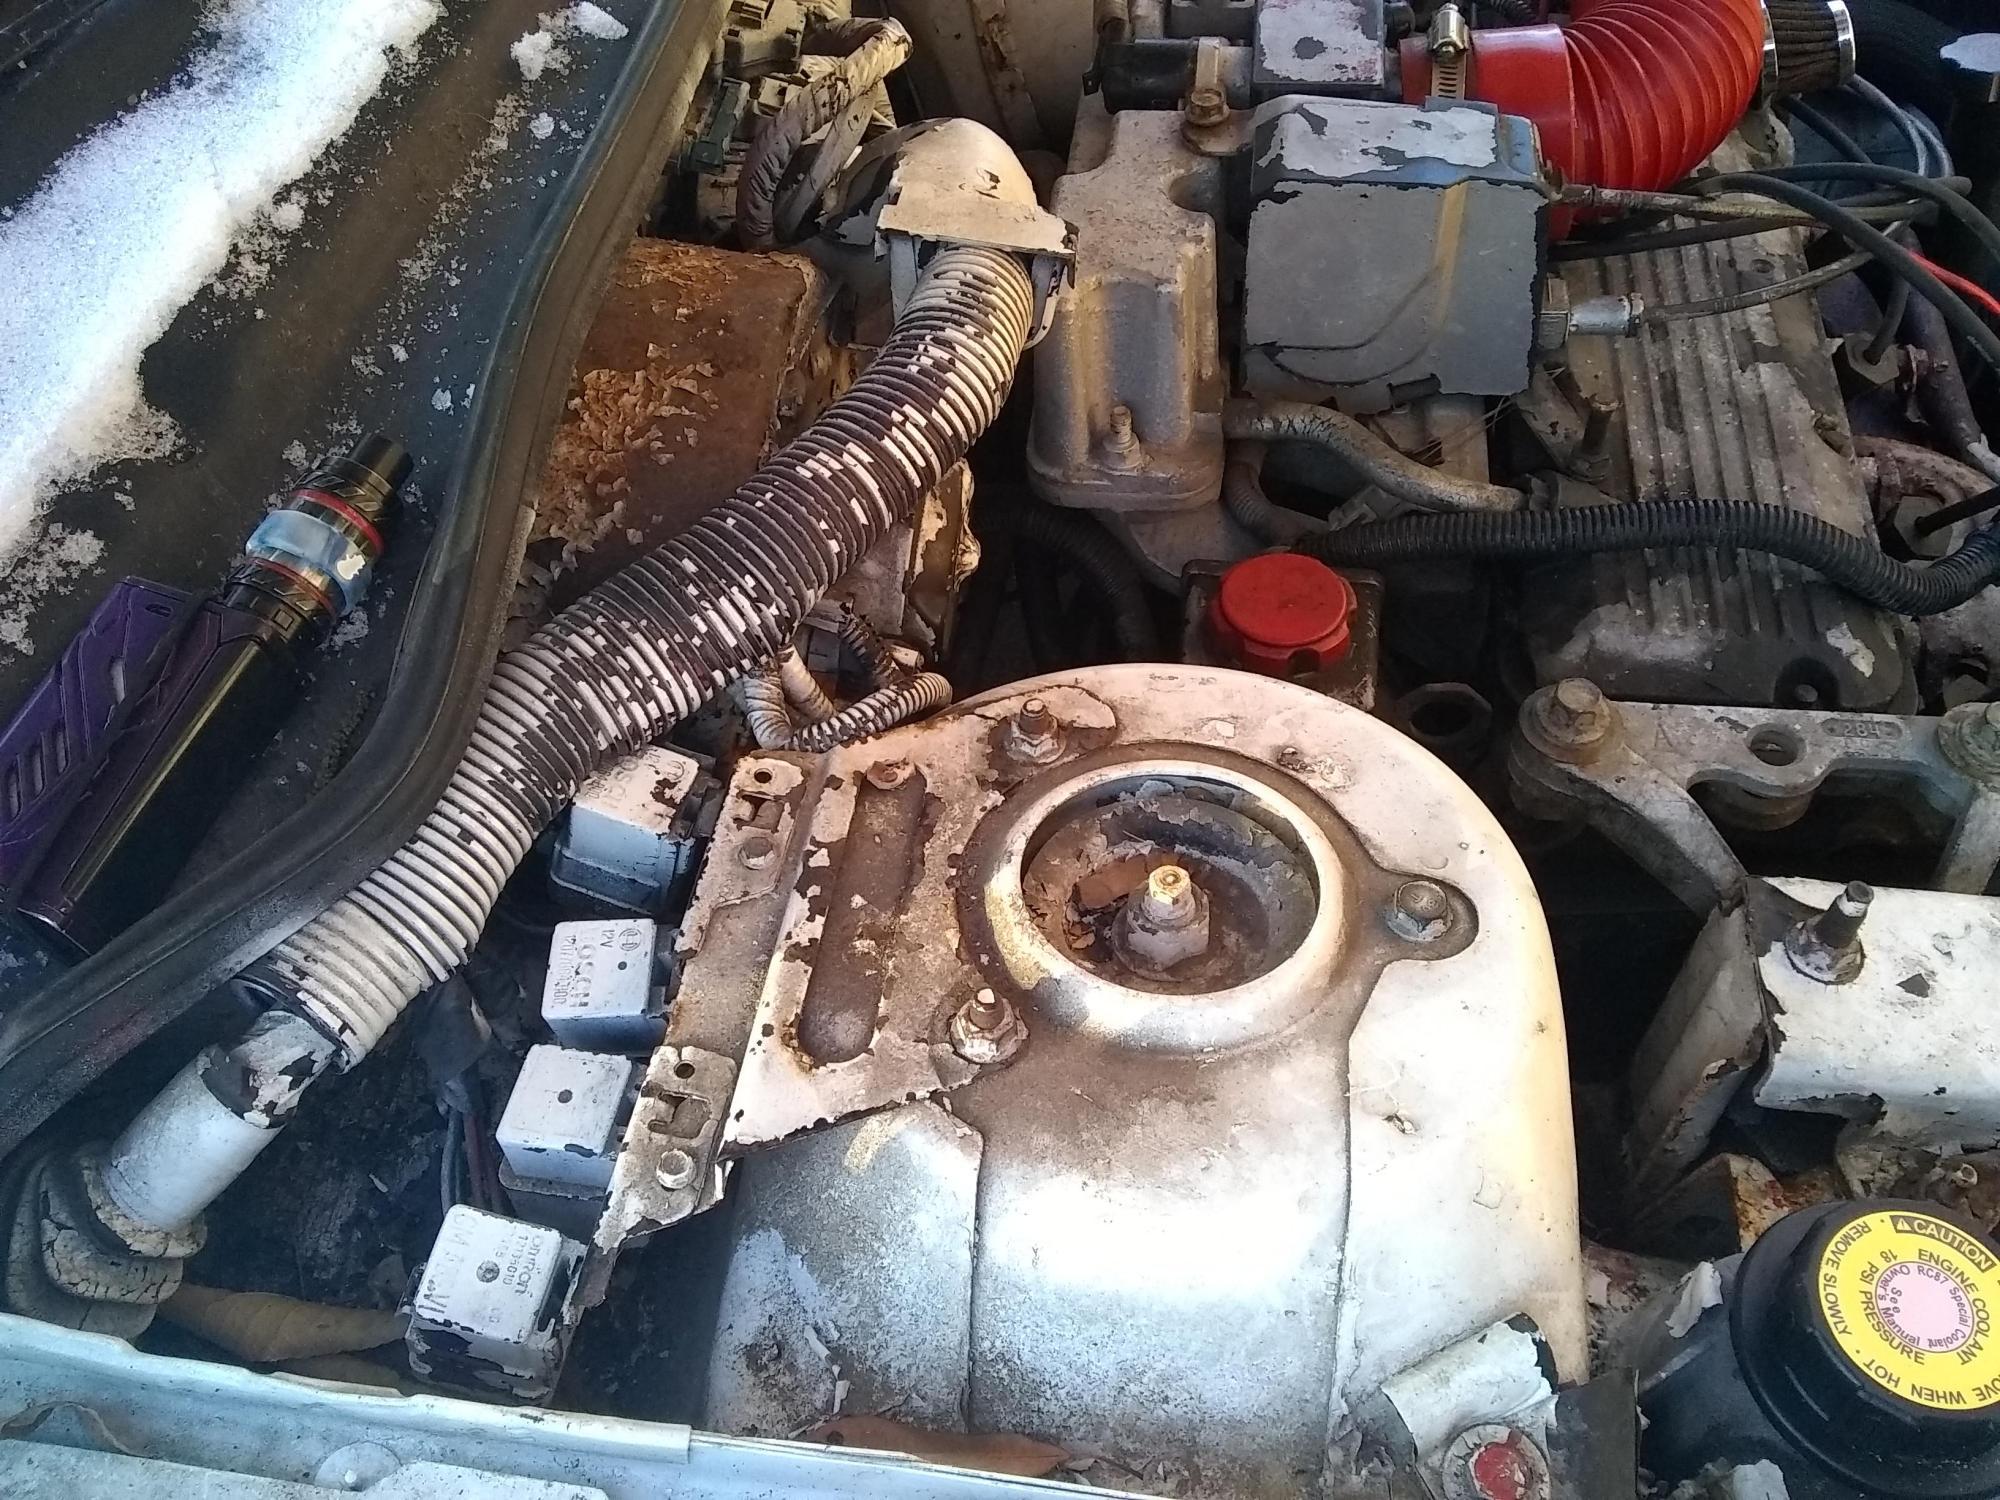 95 Corsica 2 2 Engine Diagram - 1996 chevrolet corsica ... on